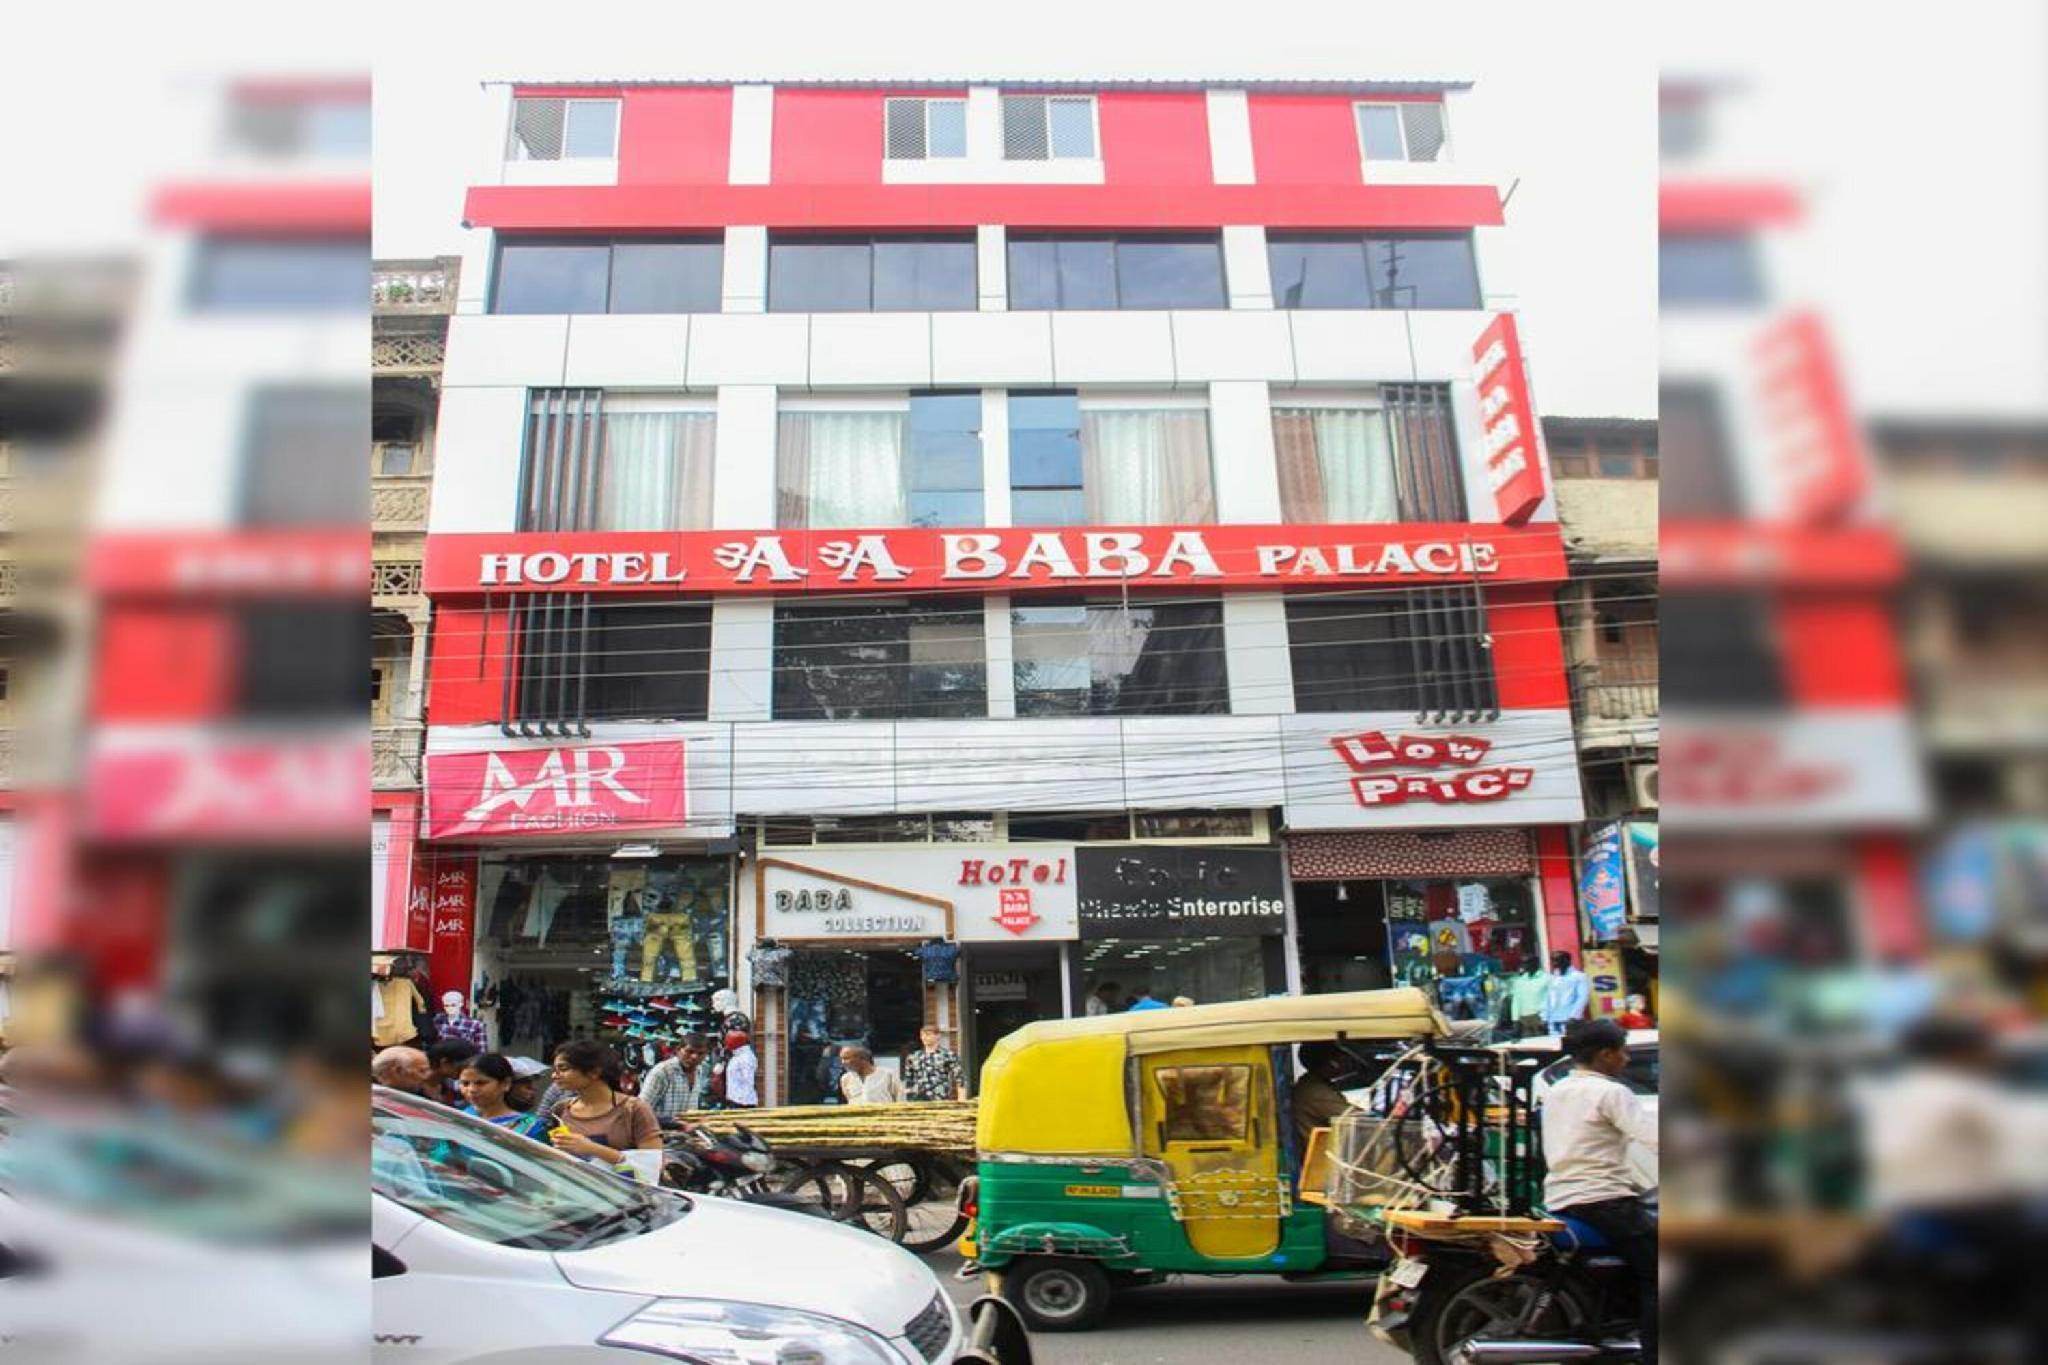 HOTEL AA BABA PALACE